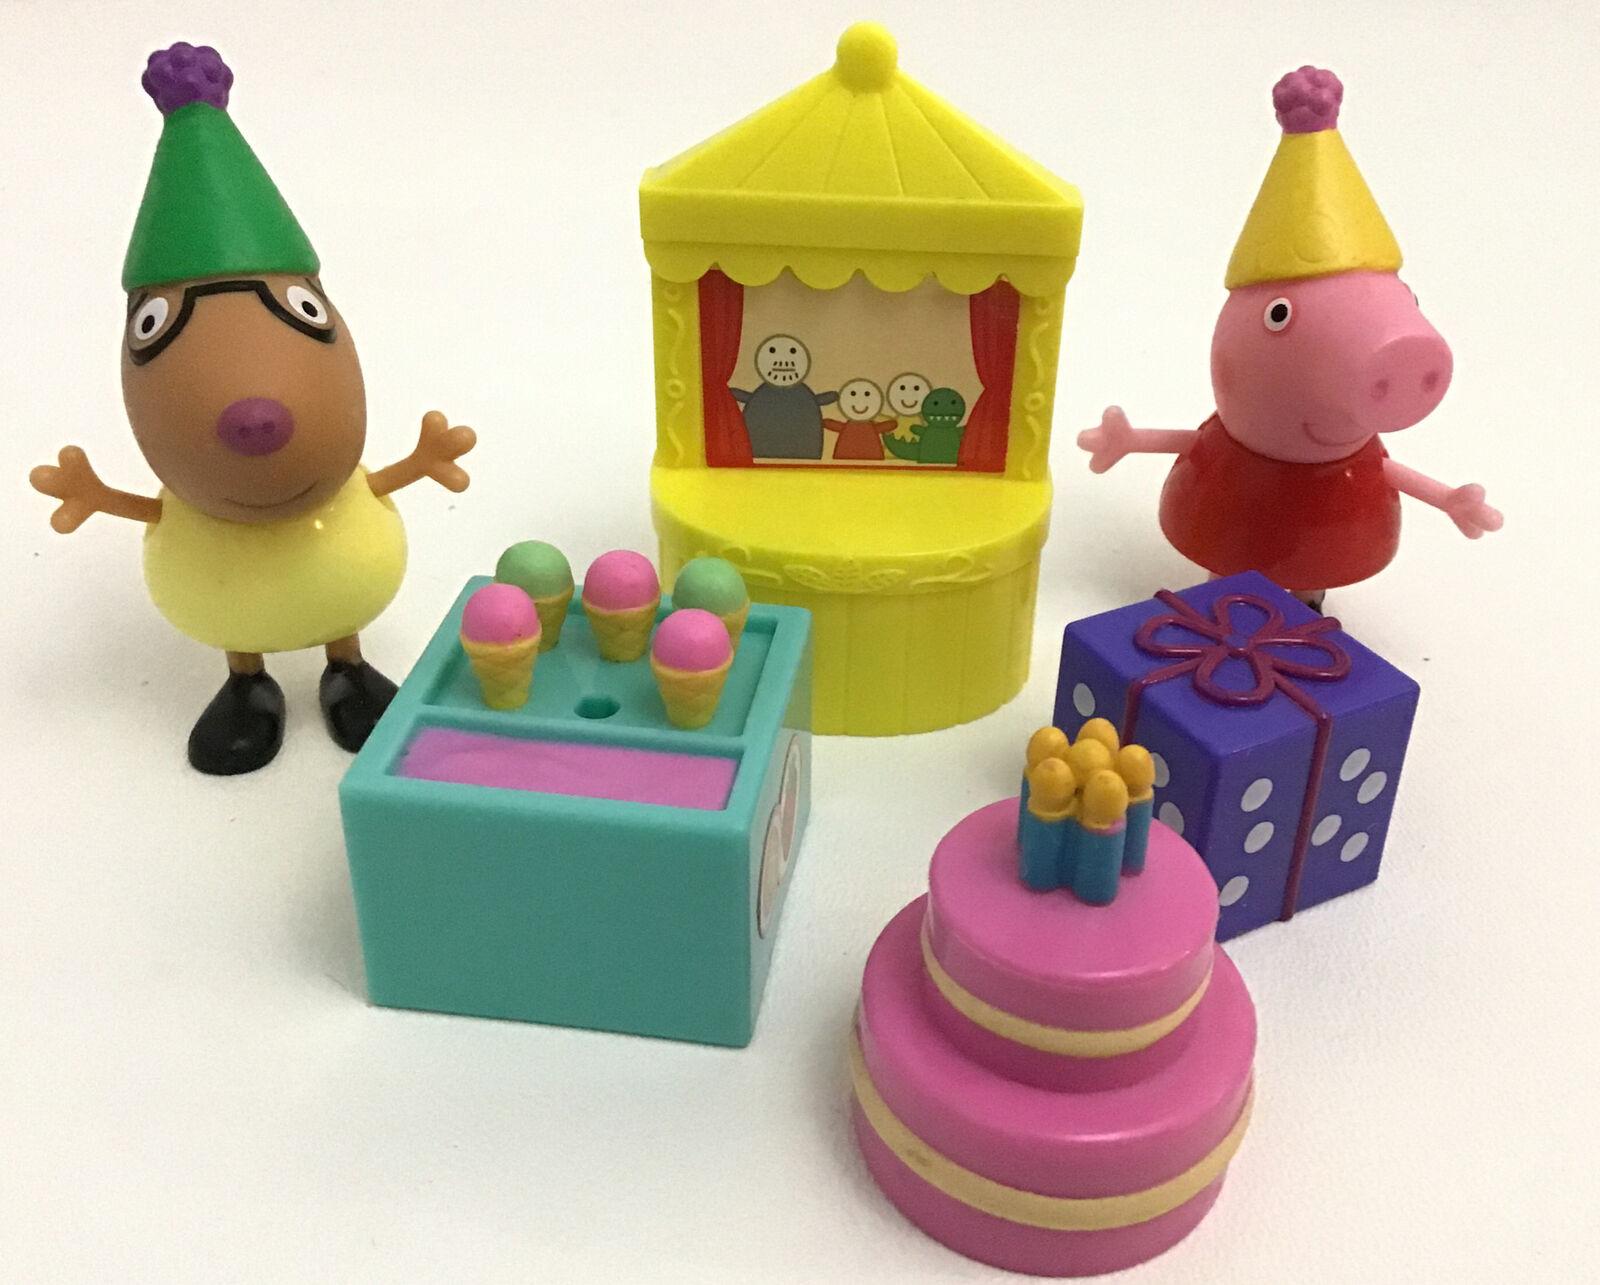 Peppa pig car and cash register shopping figuirnes cake topper